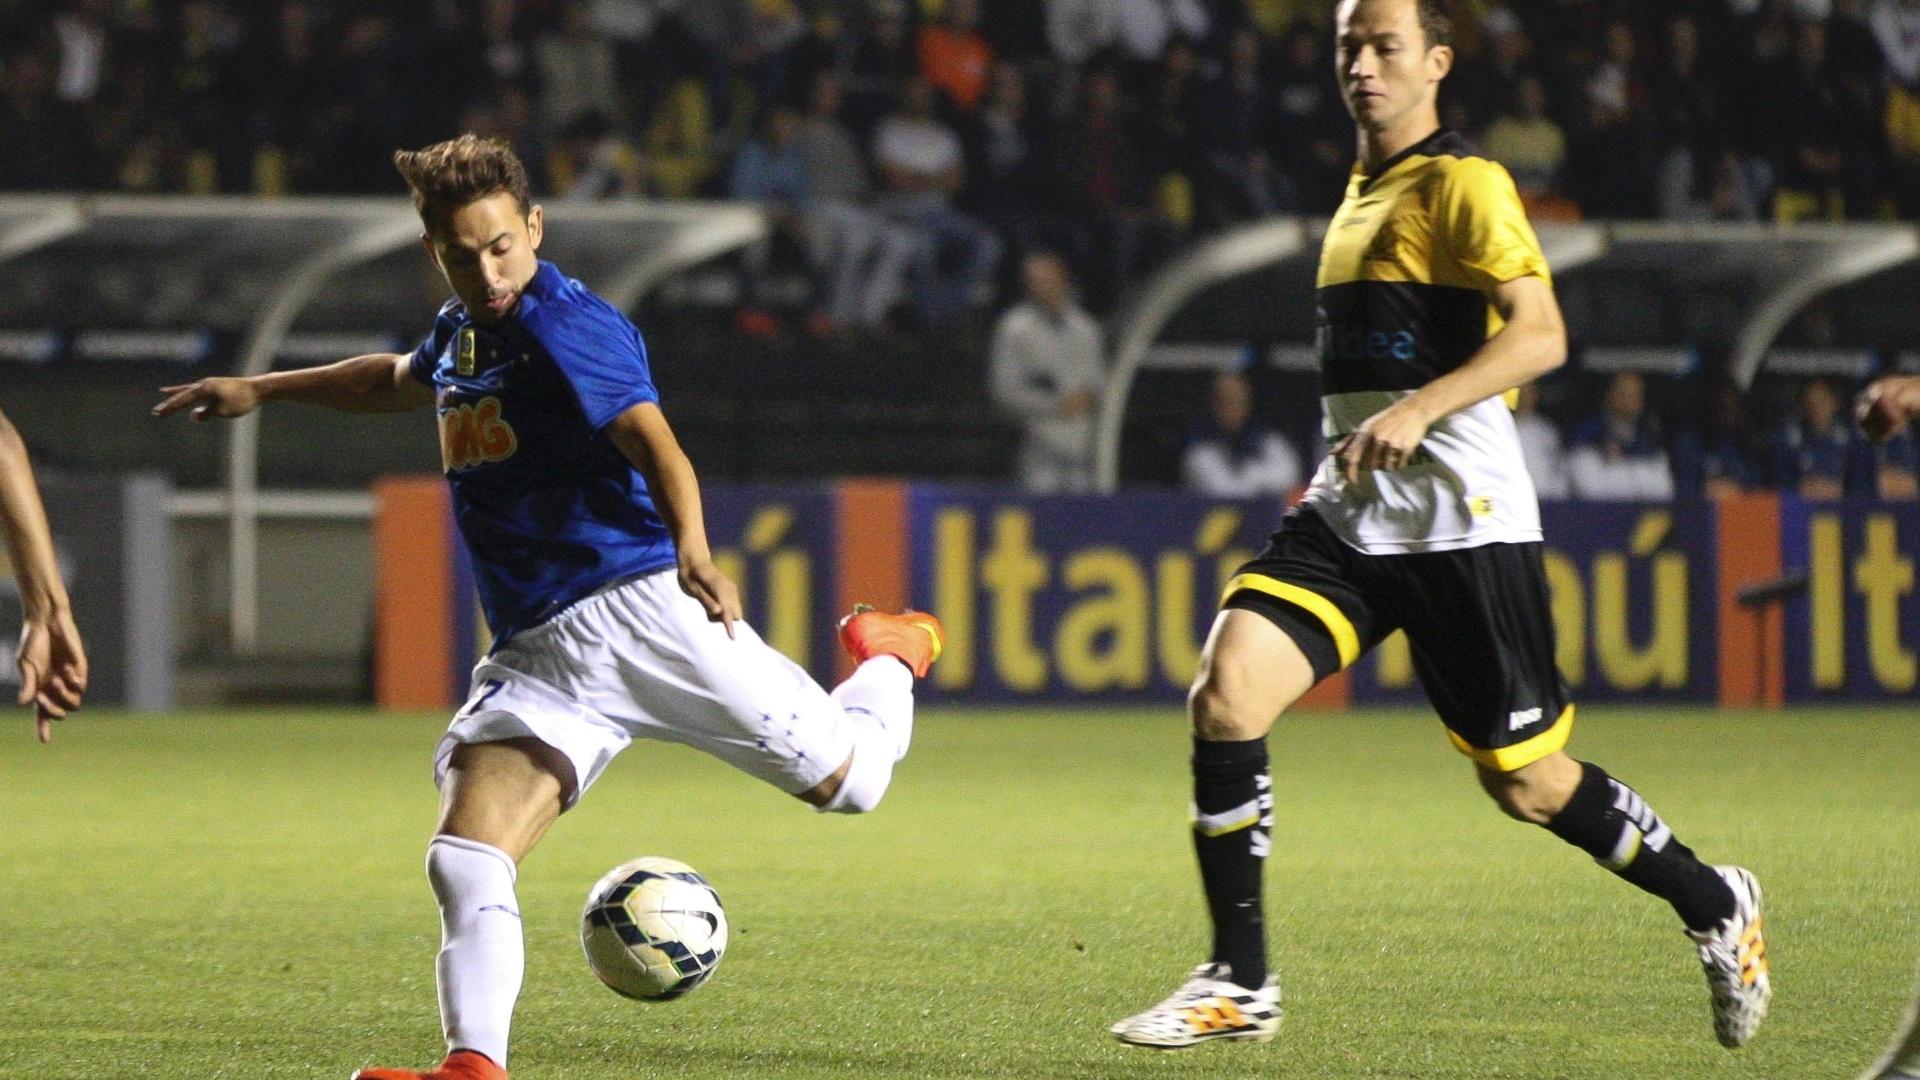 Everton Ribeiro tenta batida de esquerda durante o duelo do Cruzeiro contra o Criciúma em Santa Catarina